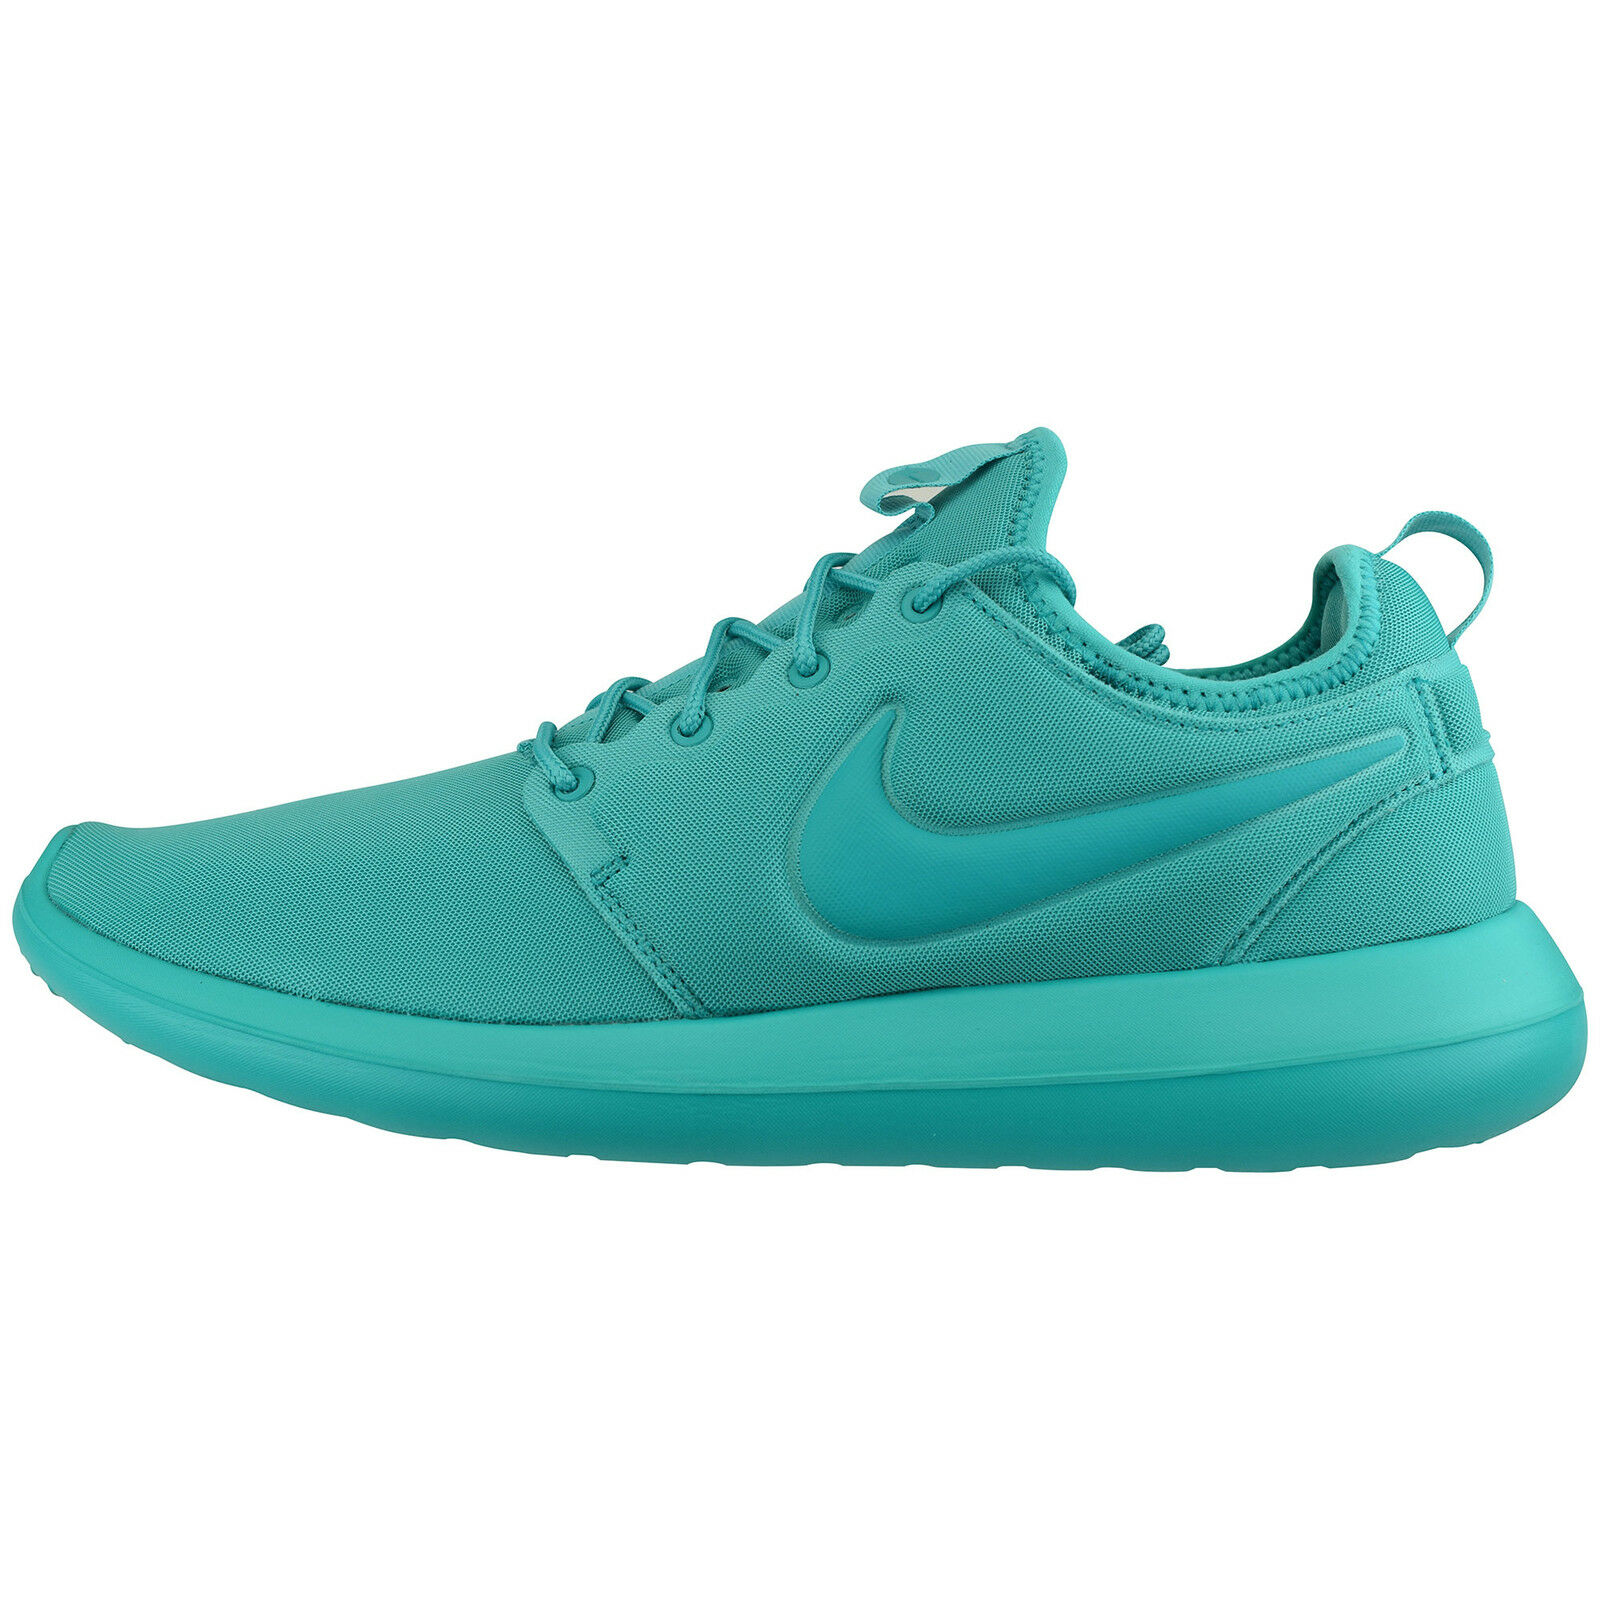 Nike Roshe Two 844656-300 Run Laufschuhe Running Sneaker Joggen Freizeitschuhe